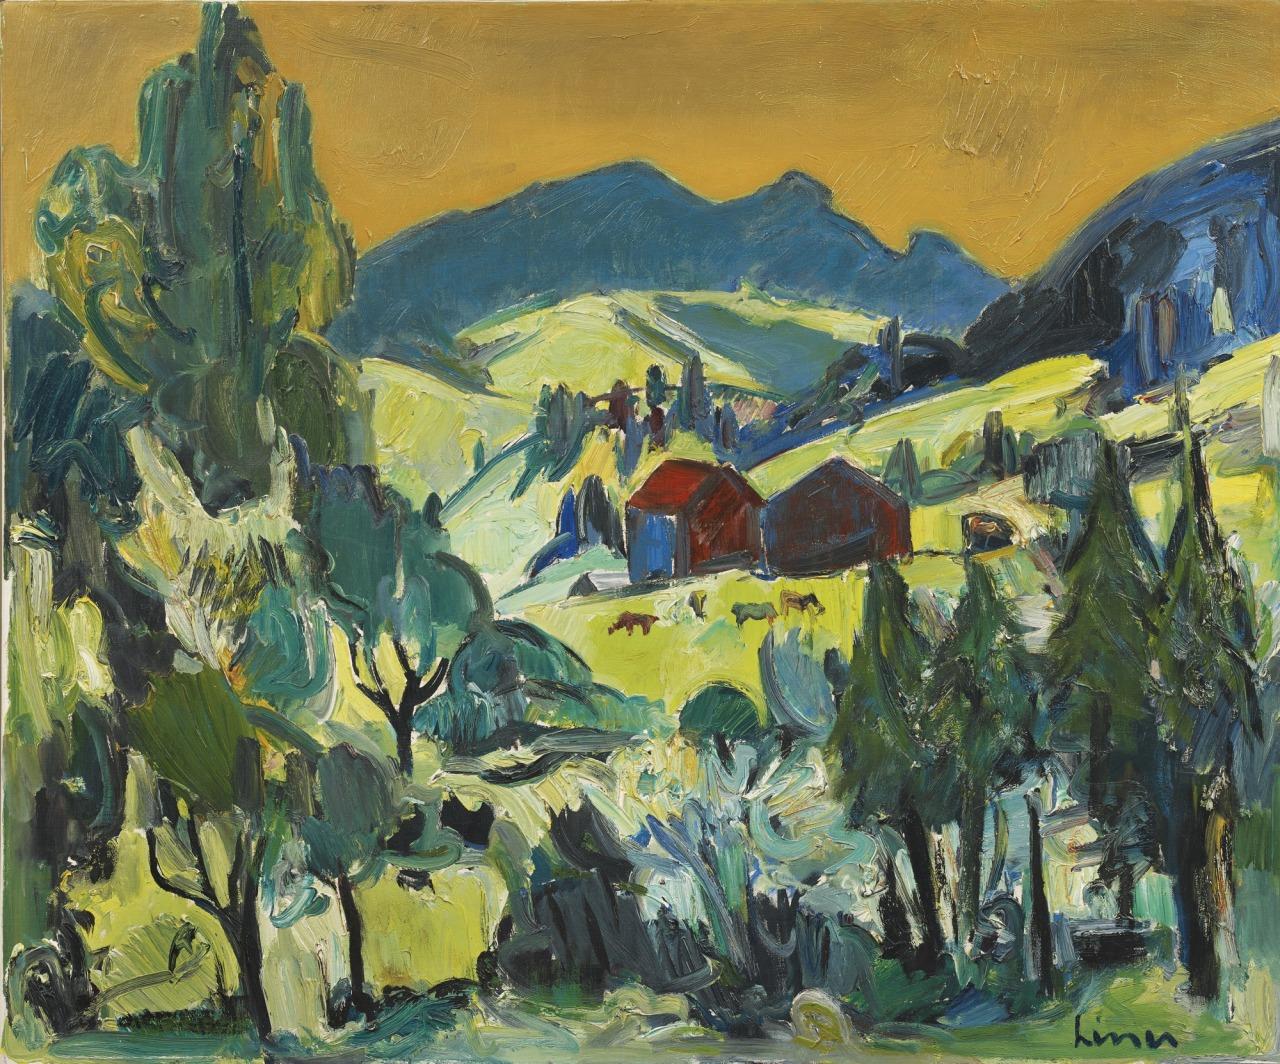 thunderstruck9:  Carl Walter Liner (Swiss, 1914-1997), Appenzeller Landschaft [Appenzell landscape], Oil on canvas, 95 x 115.5 cm.